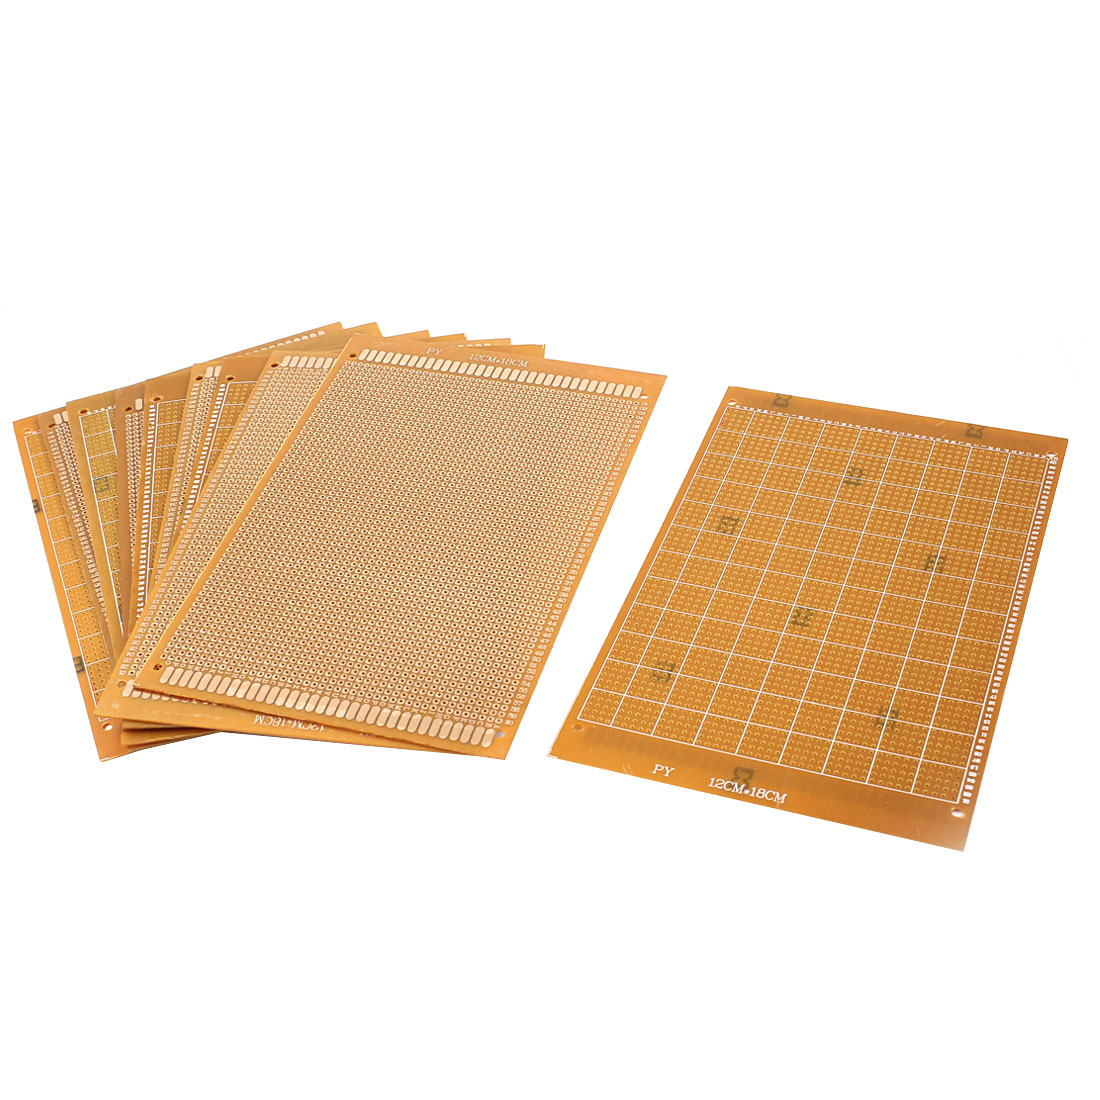 10 Pcs Prototyping Experiment Tester Matrix PCB Circuit Plate Board 12cm x 18cm